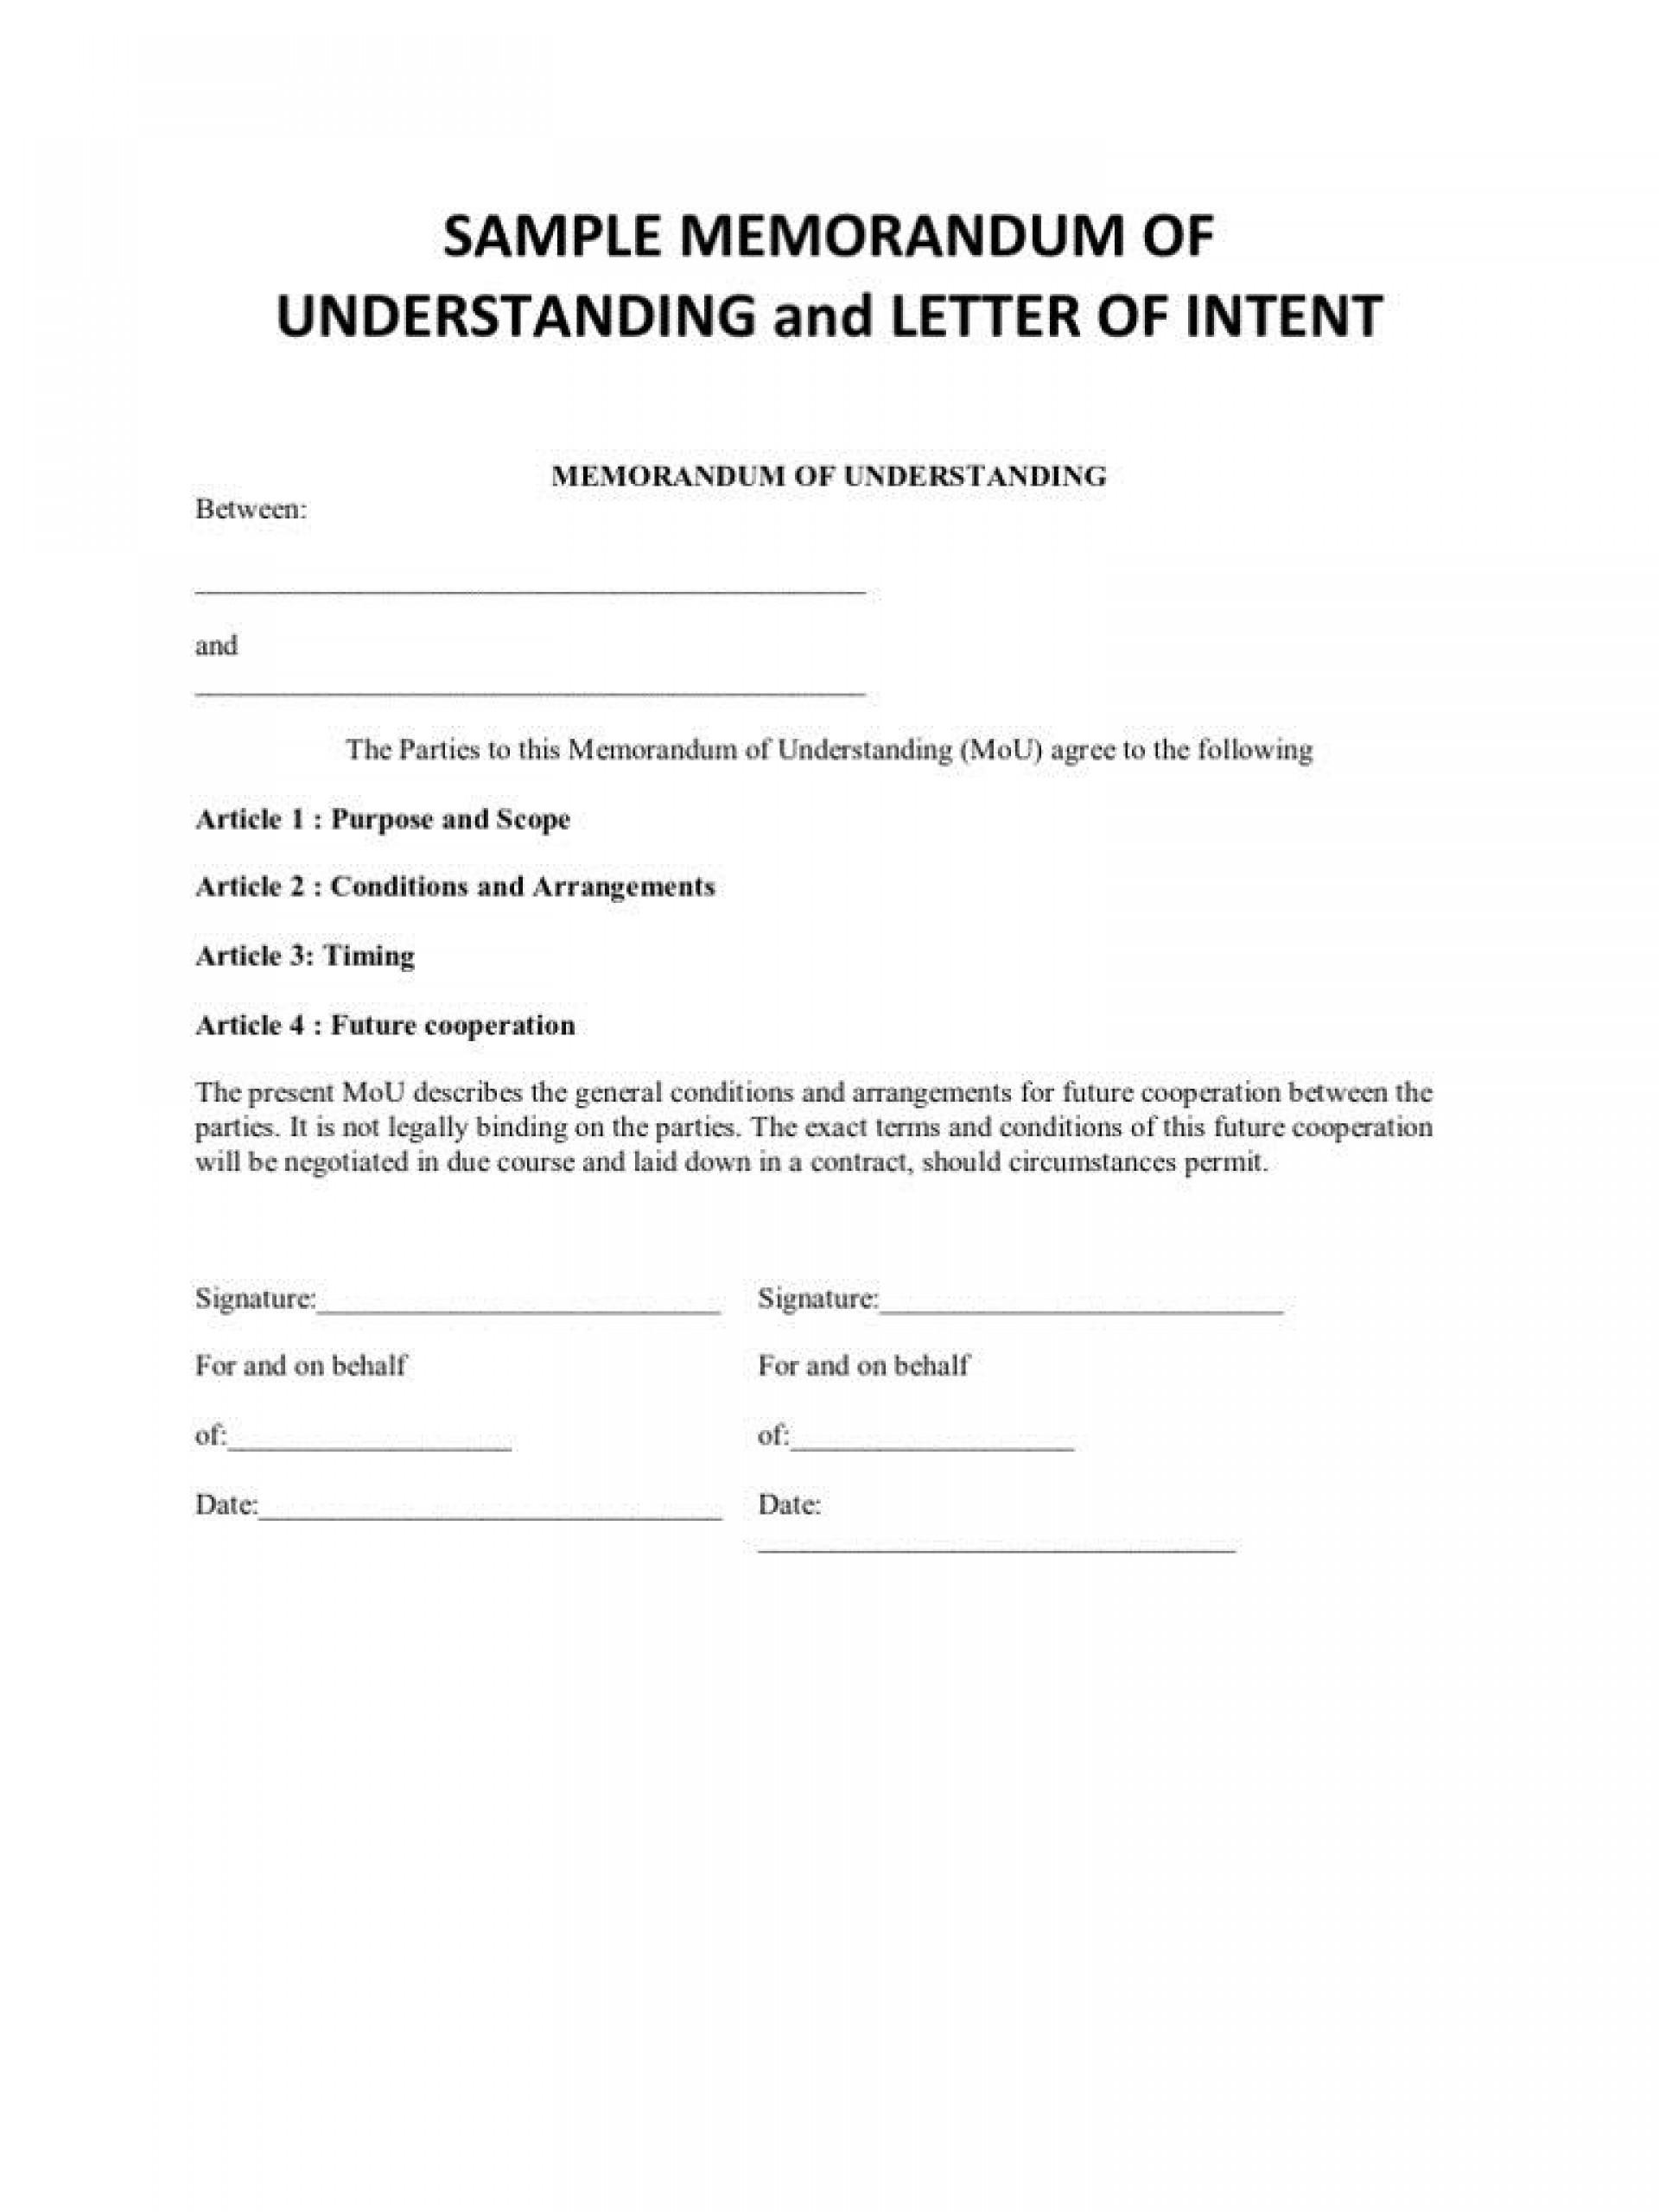 000 Astounding Letter Of Understanding Sample Example  Samples Template Word1920